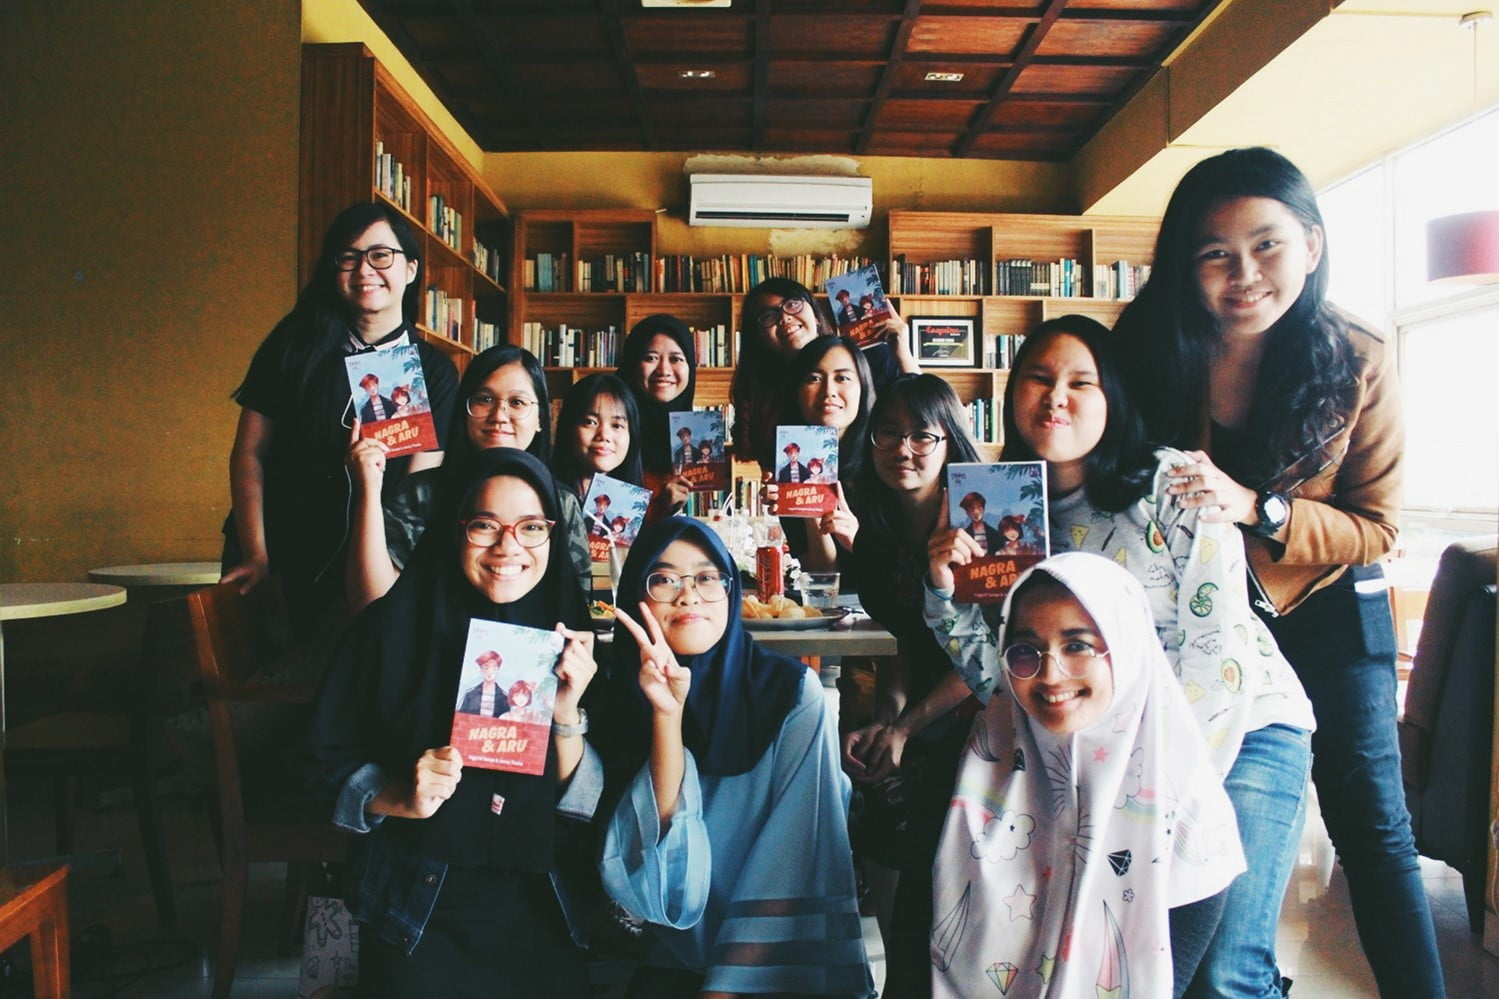 Nagra dan Aru, The Reading Room, Kemang Sensasi Makan di Perpustakaan - Serunya Kumpul dan Makan Siang Bareng Nagra dan Aru